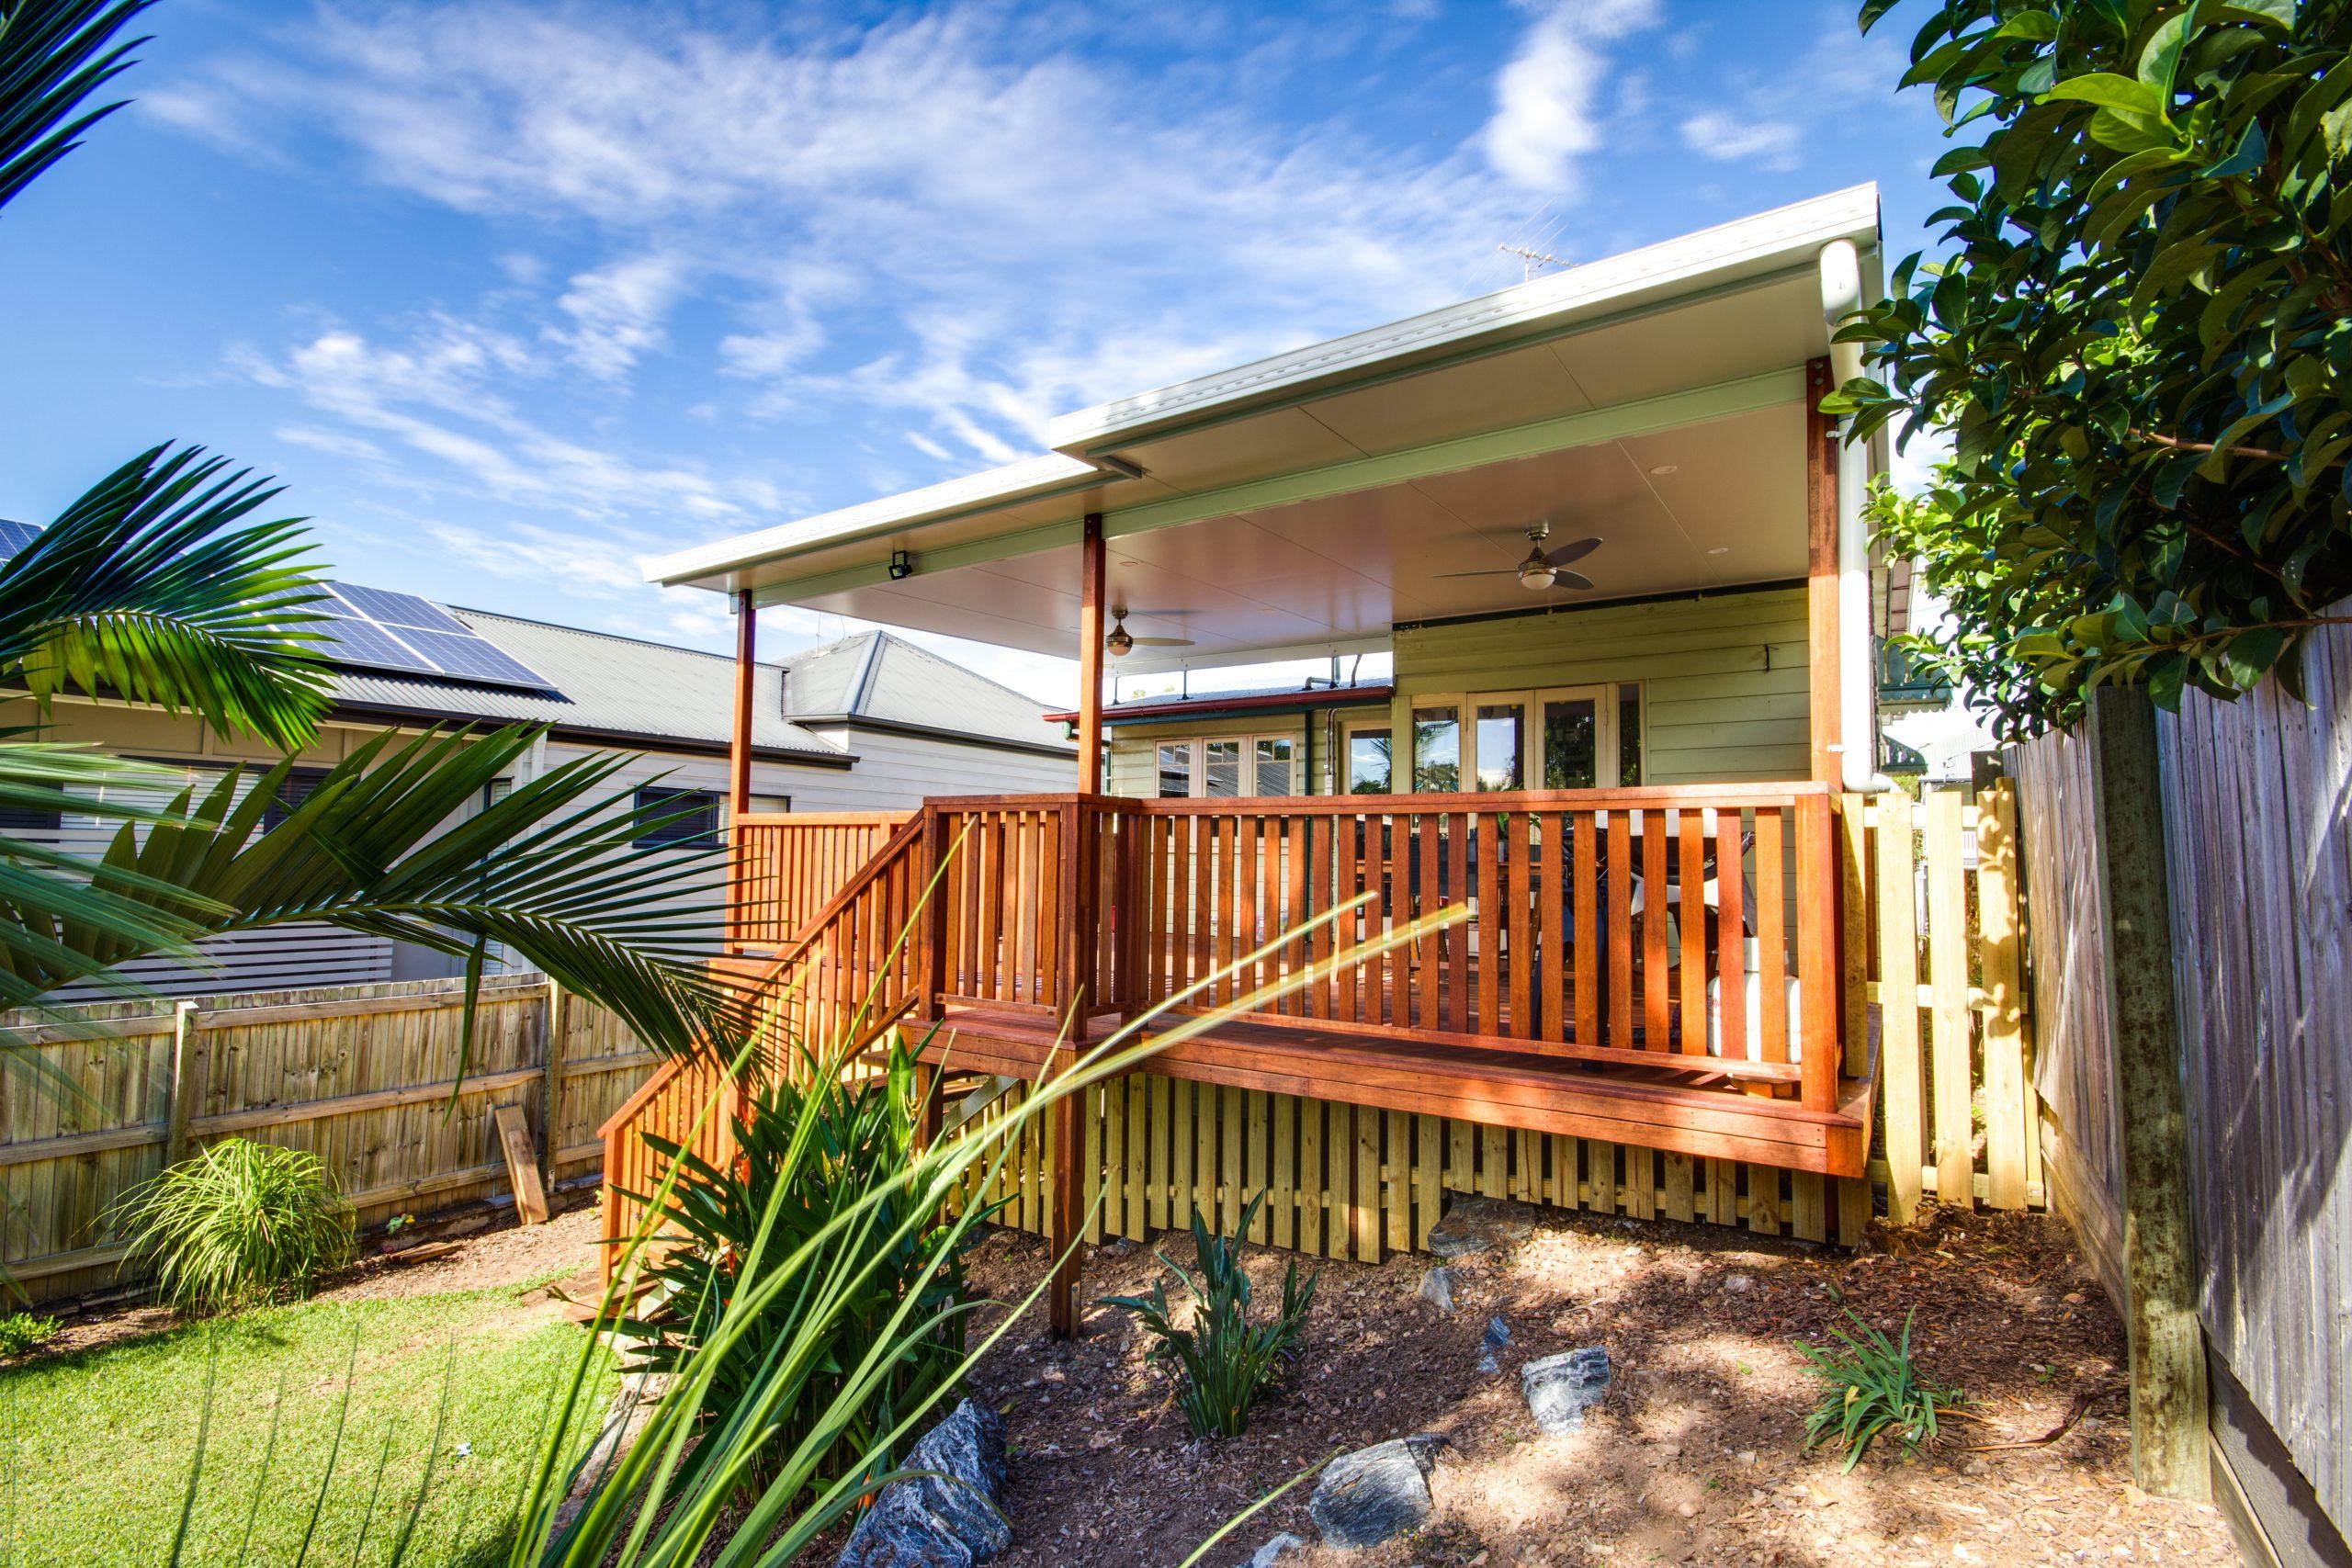 Outdoor Patio Roofing Options Brisbane, Sunshine Coast, Gold Coast SE QLD, Australia